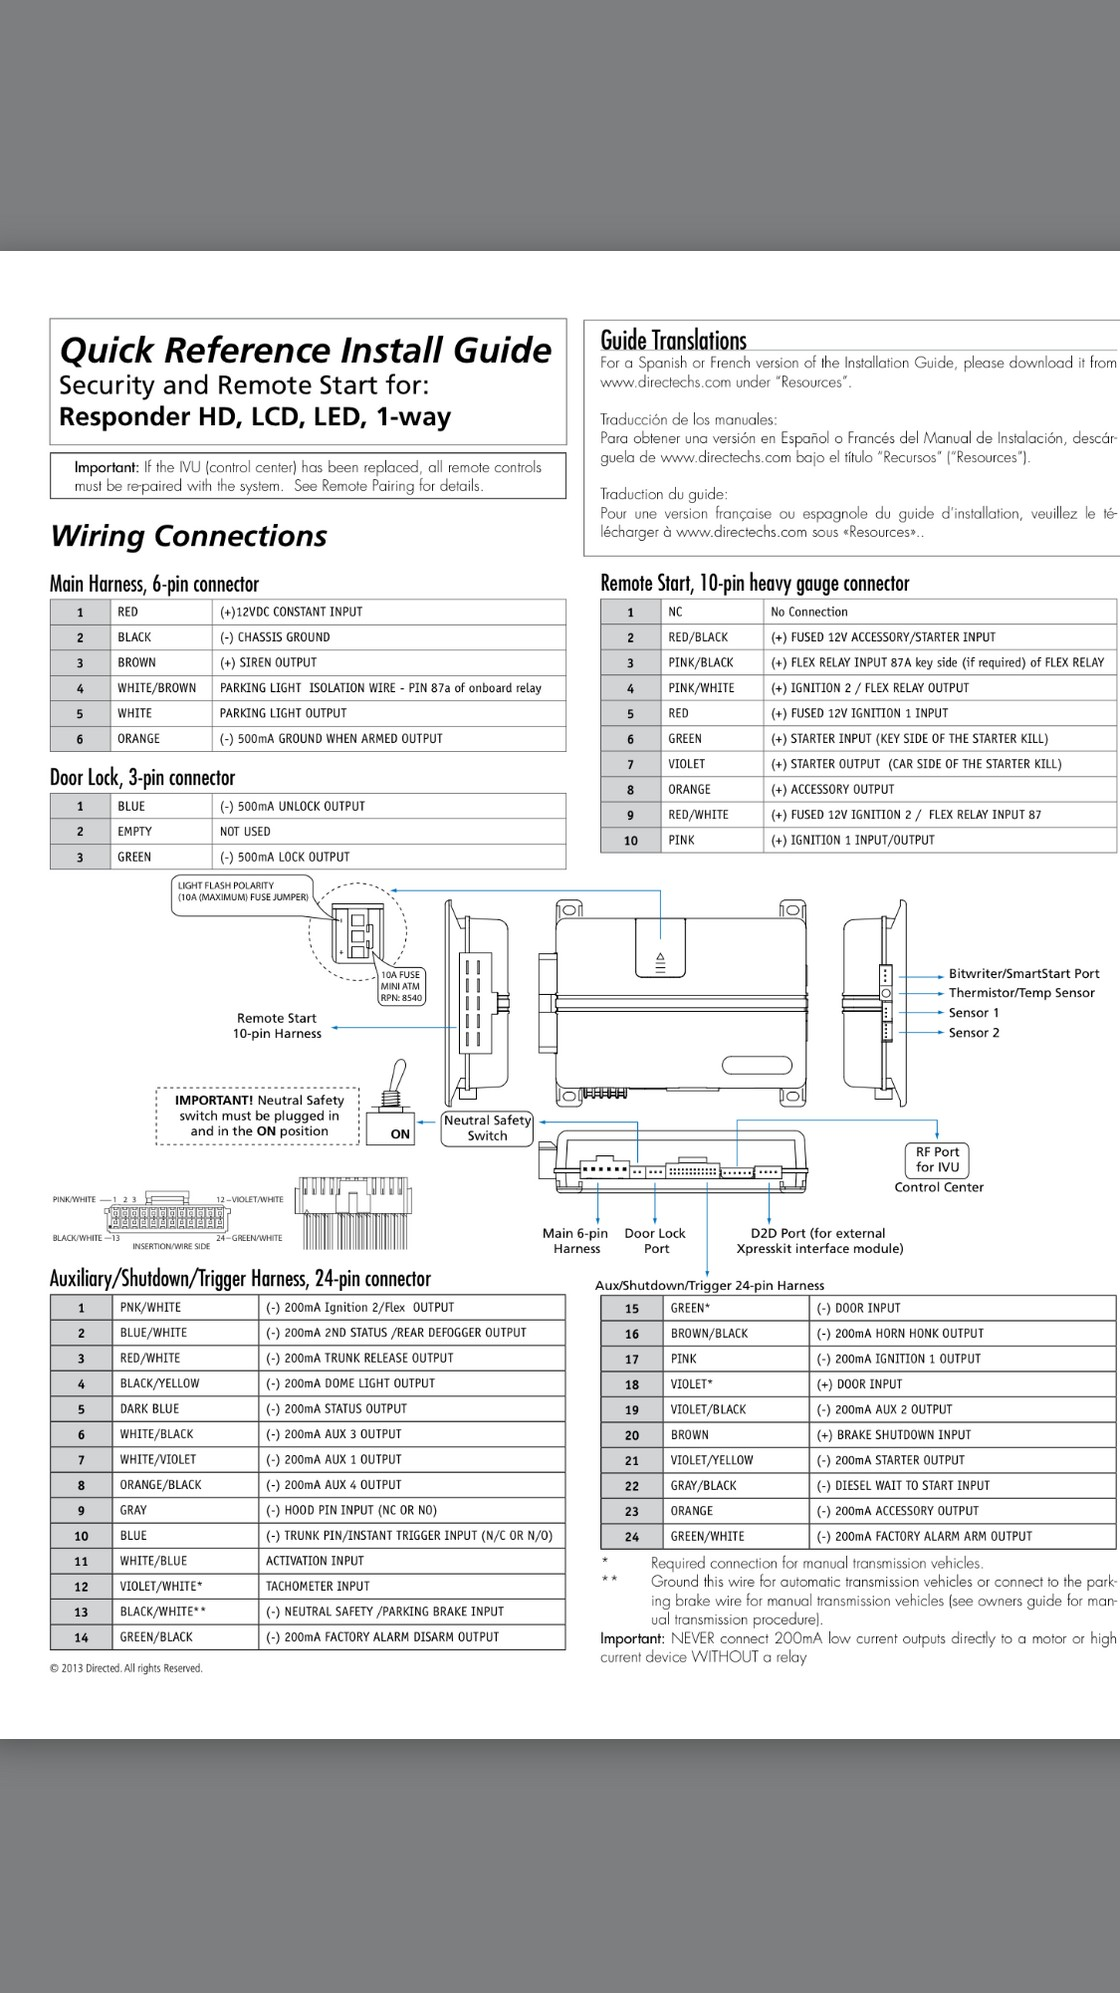 Viper 5706v Installation Guide Diagram Viper 5706v Install Help Honda Tech Honda forum Discussion Of Viper 5706v Installation Guide Diagram